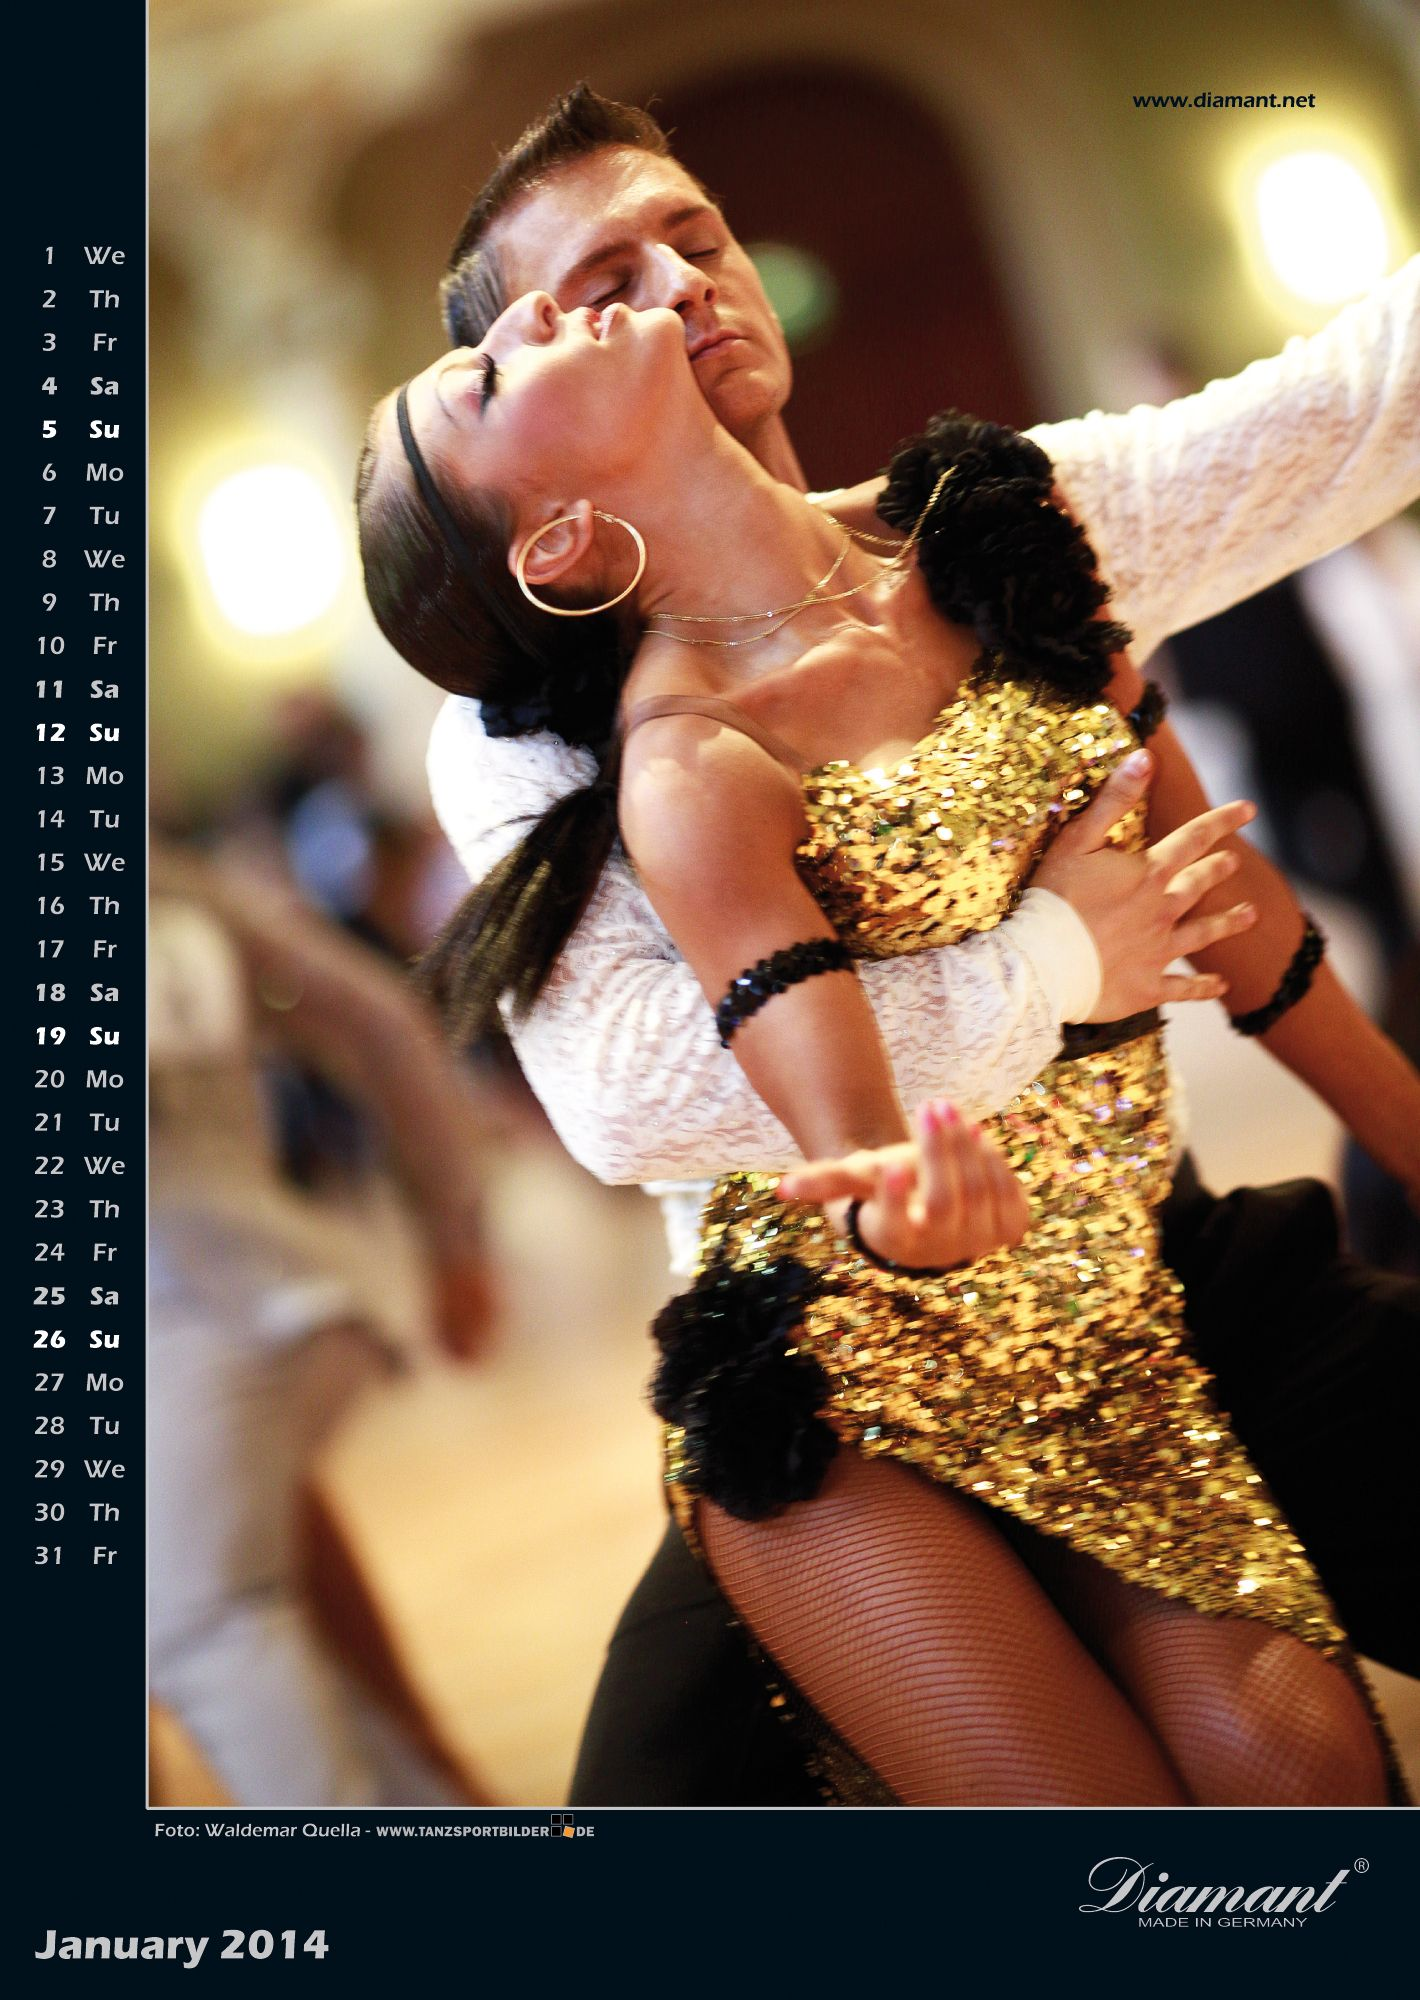 Diamant Dance Emotions January